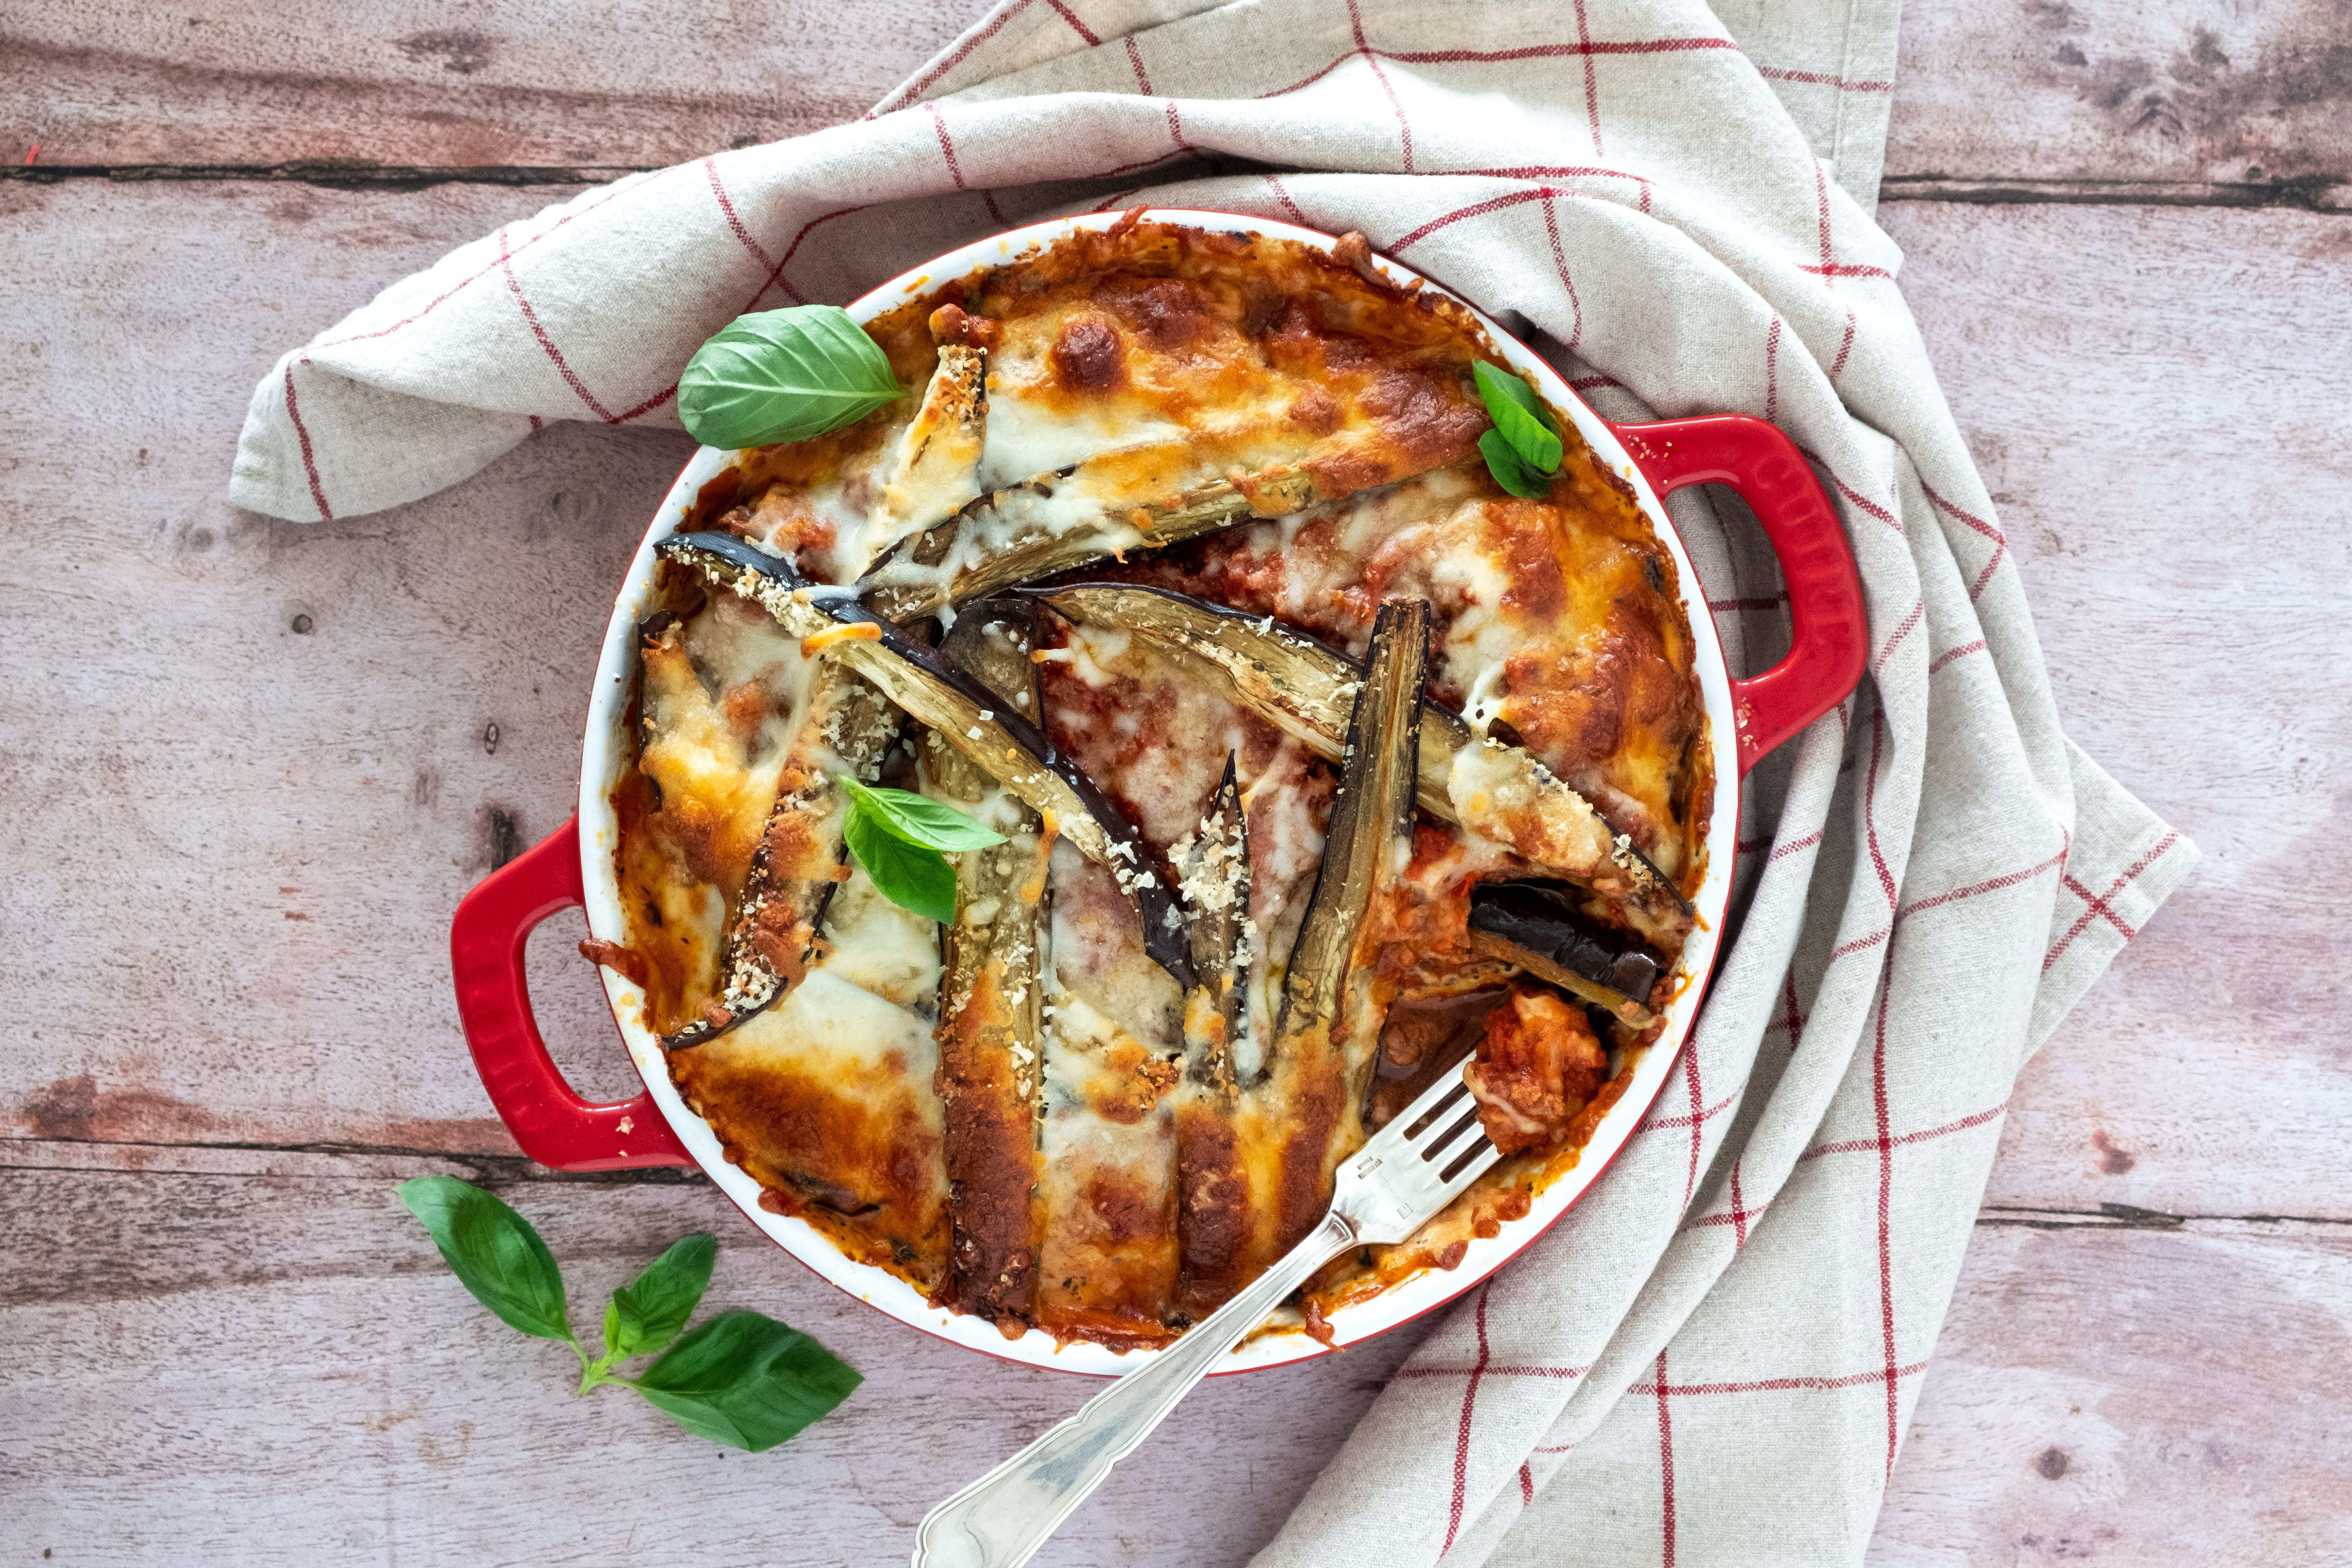 Cheesy Beef and Eggplant Lasagna